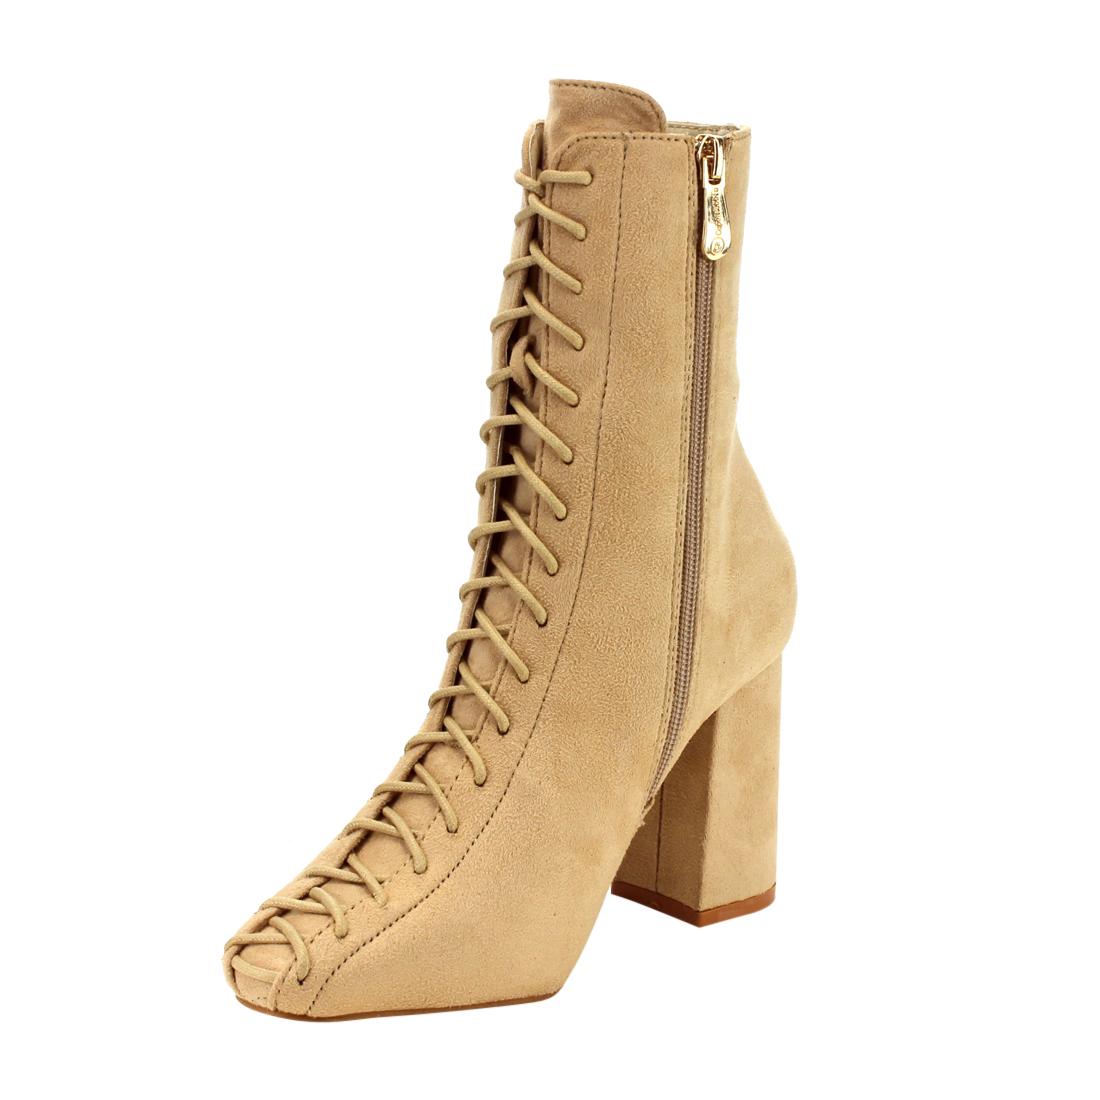 GD77 Women's Lace-Up Size Zipper Block Heel Ankle Booties